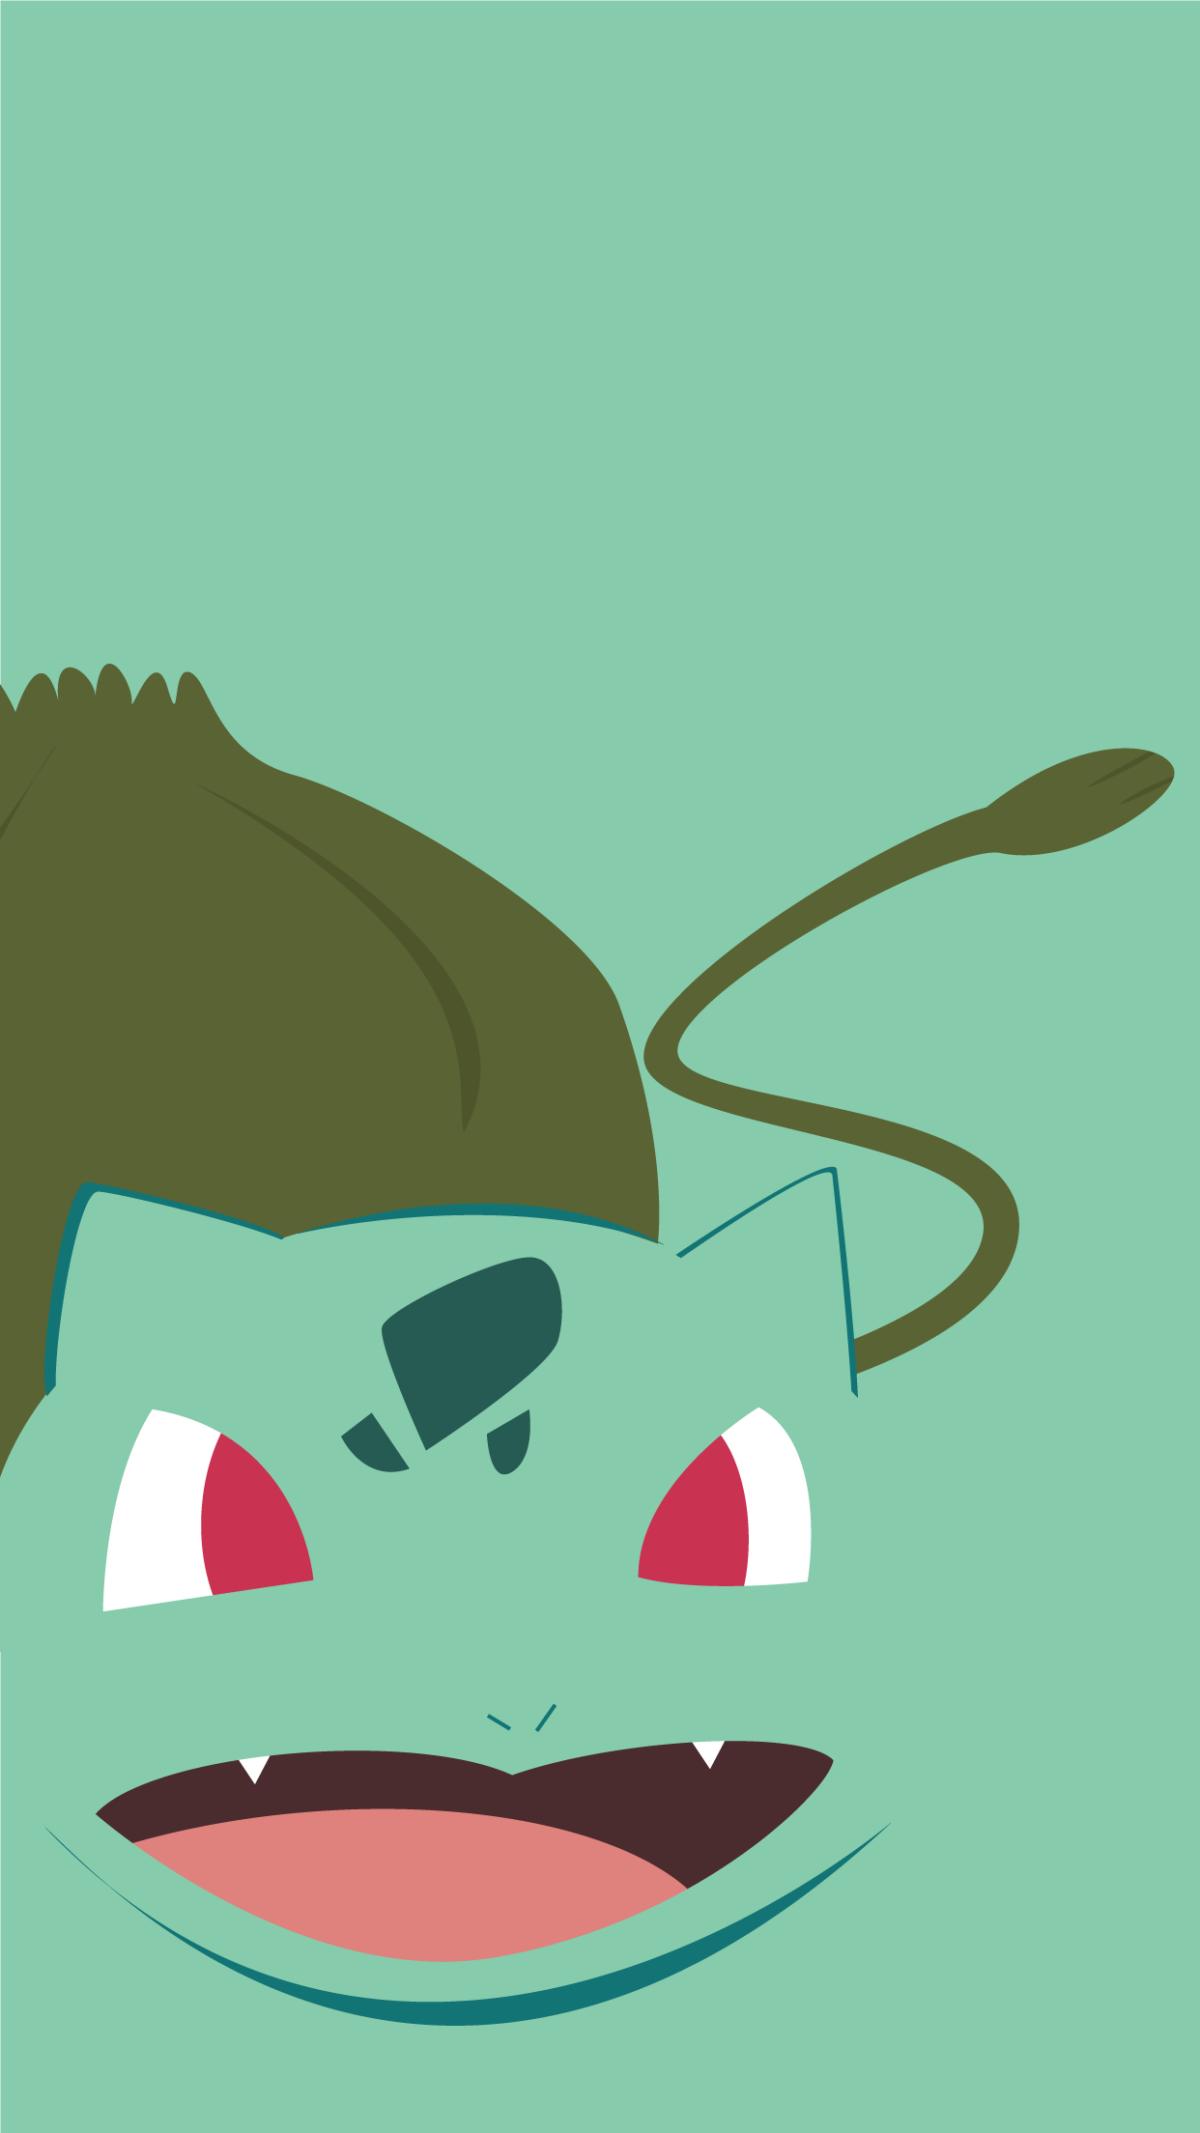 21 Best Pokémon Bulbasaur Wallpaper for Your iPhone | News Share